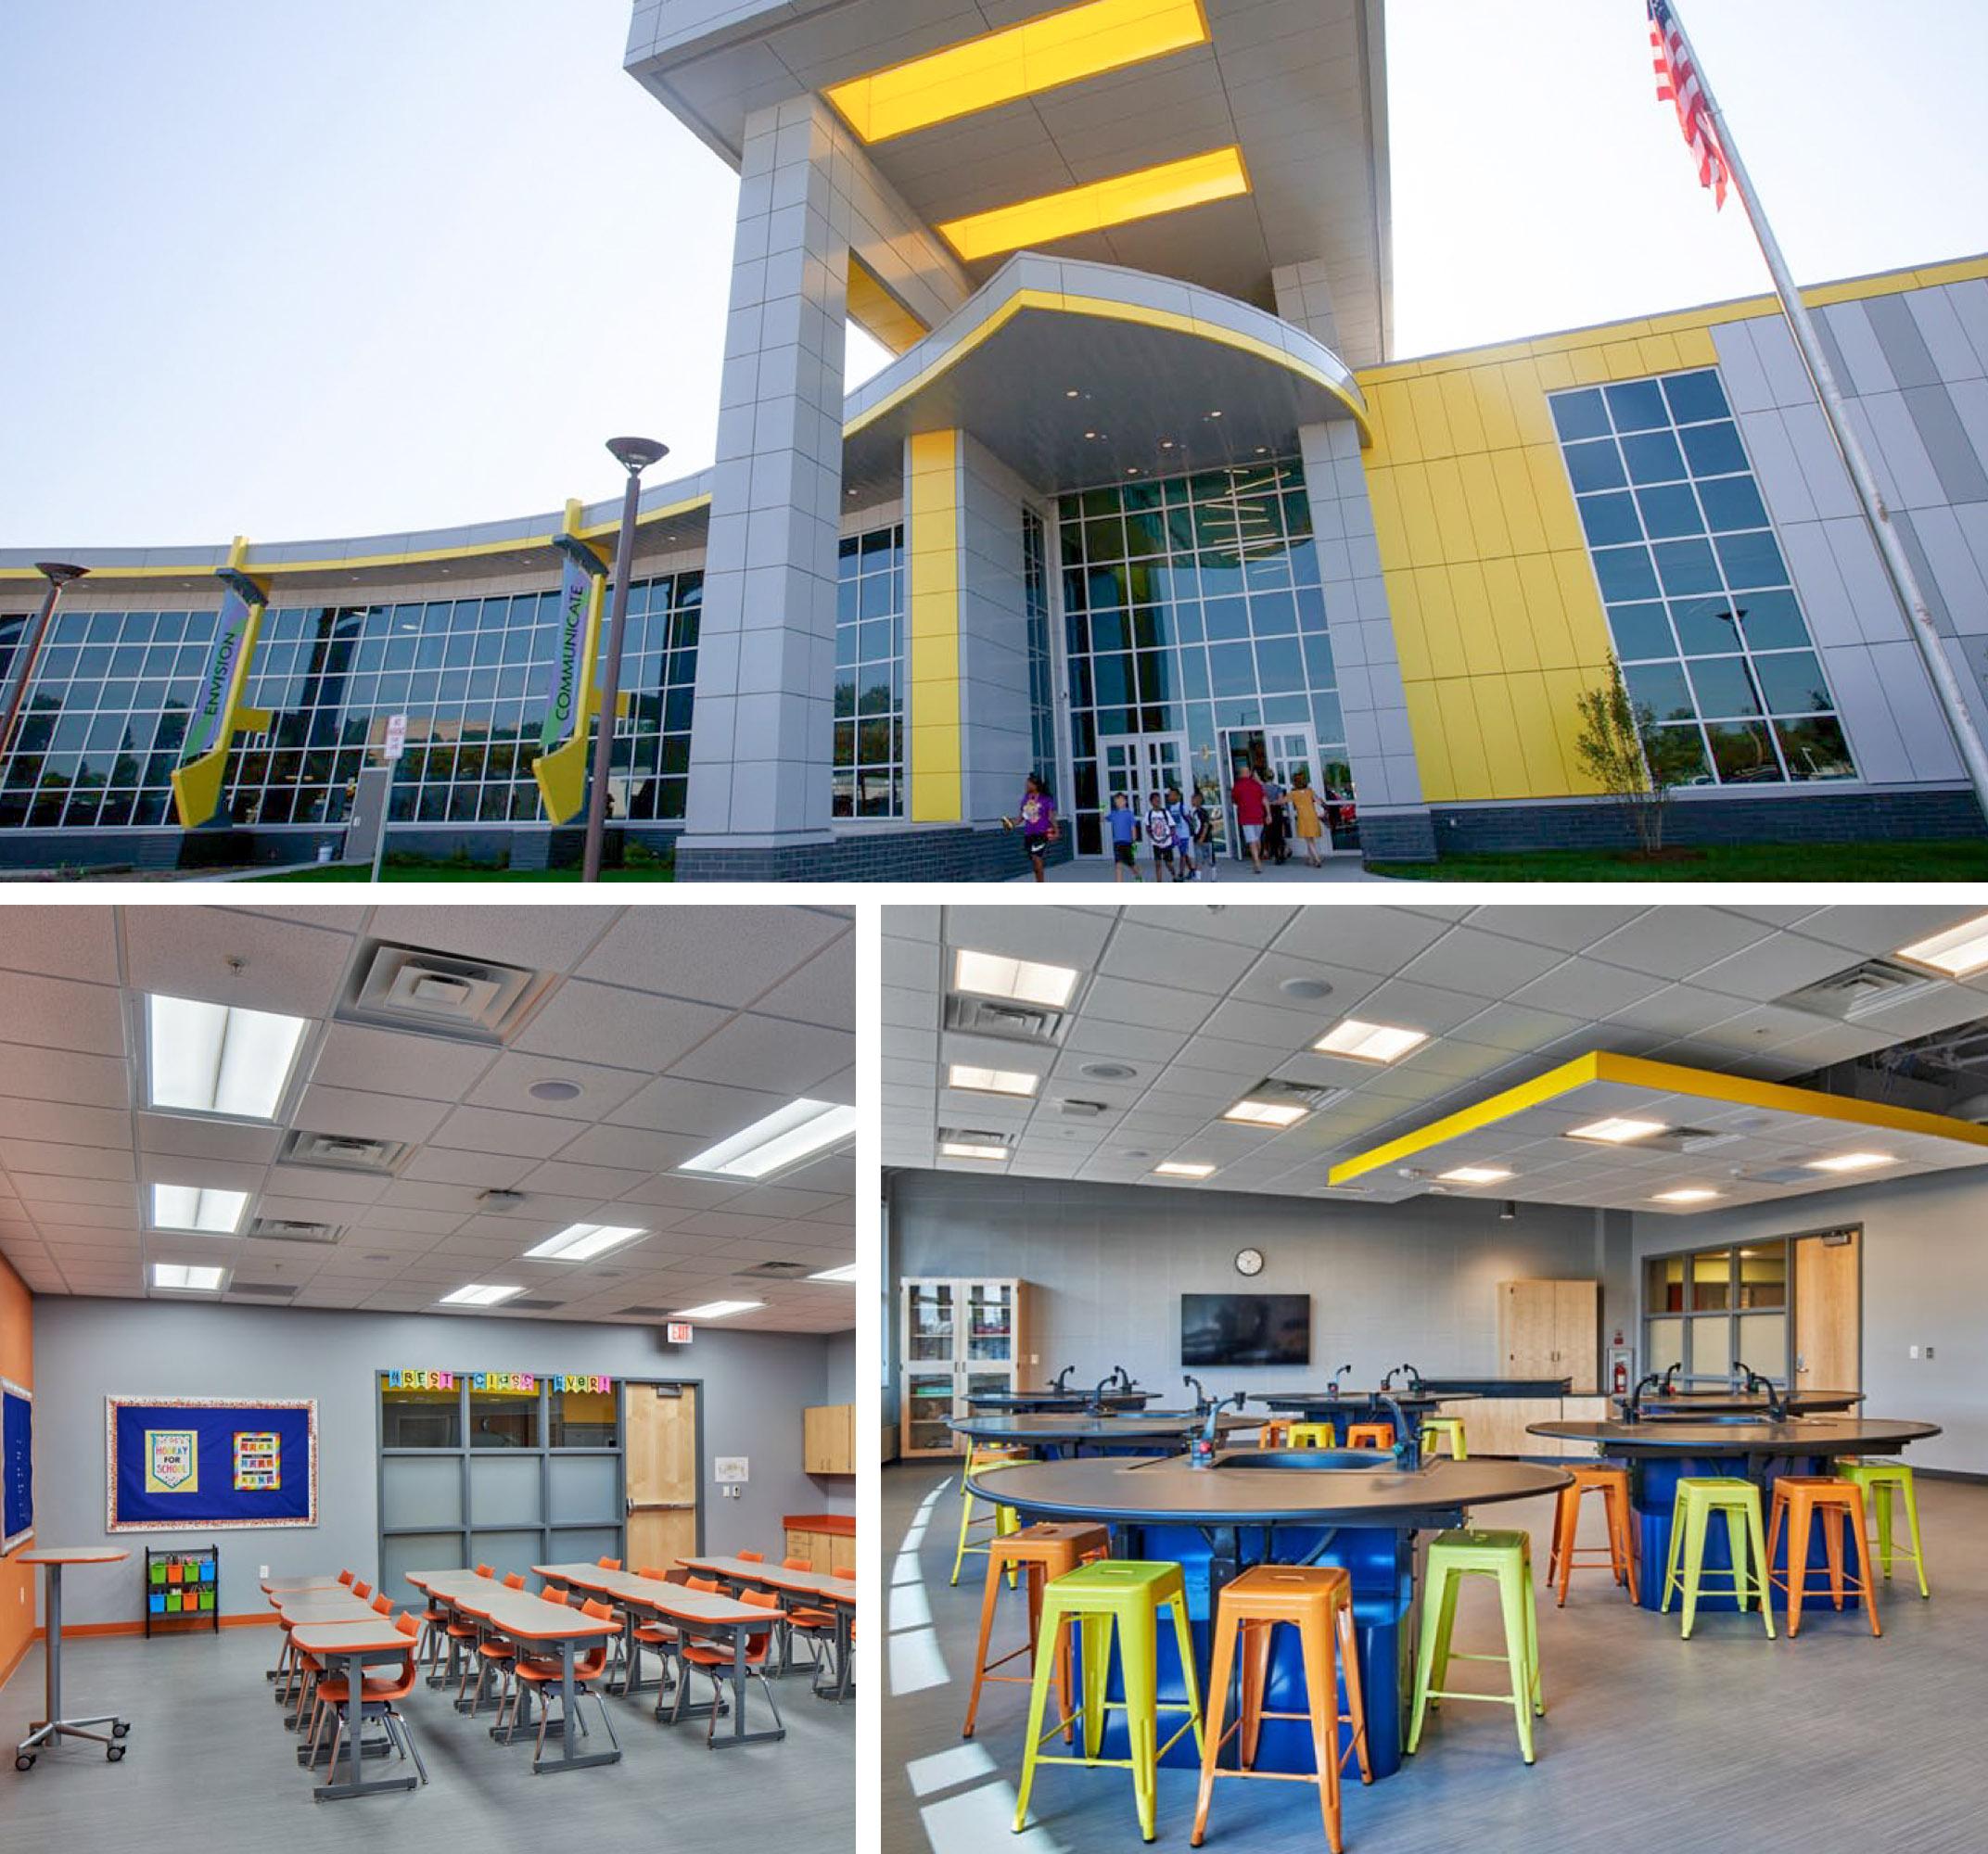 Inside of the new Flint Cultural Center Academy